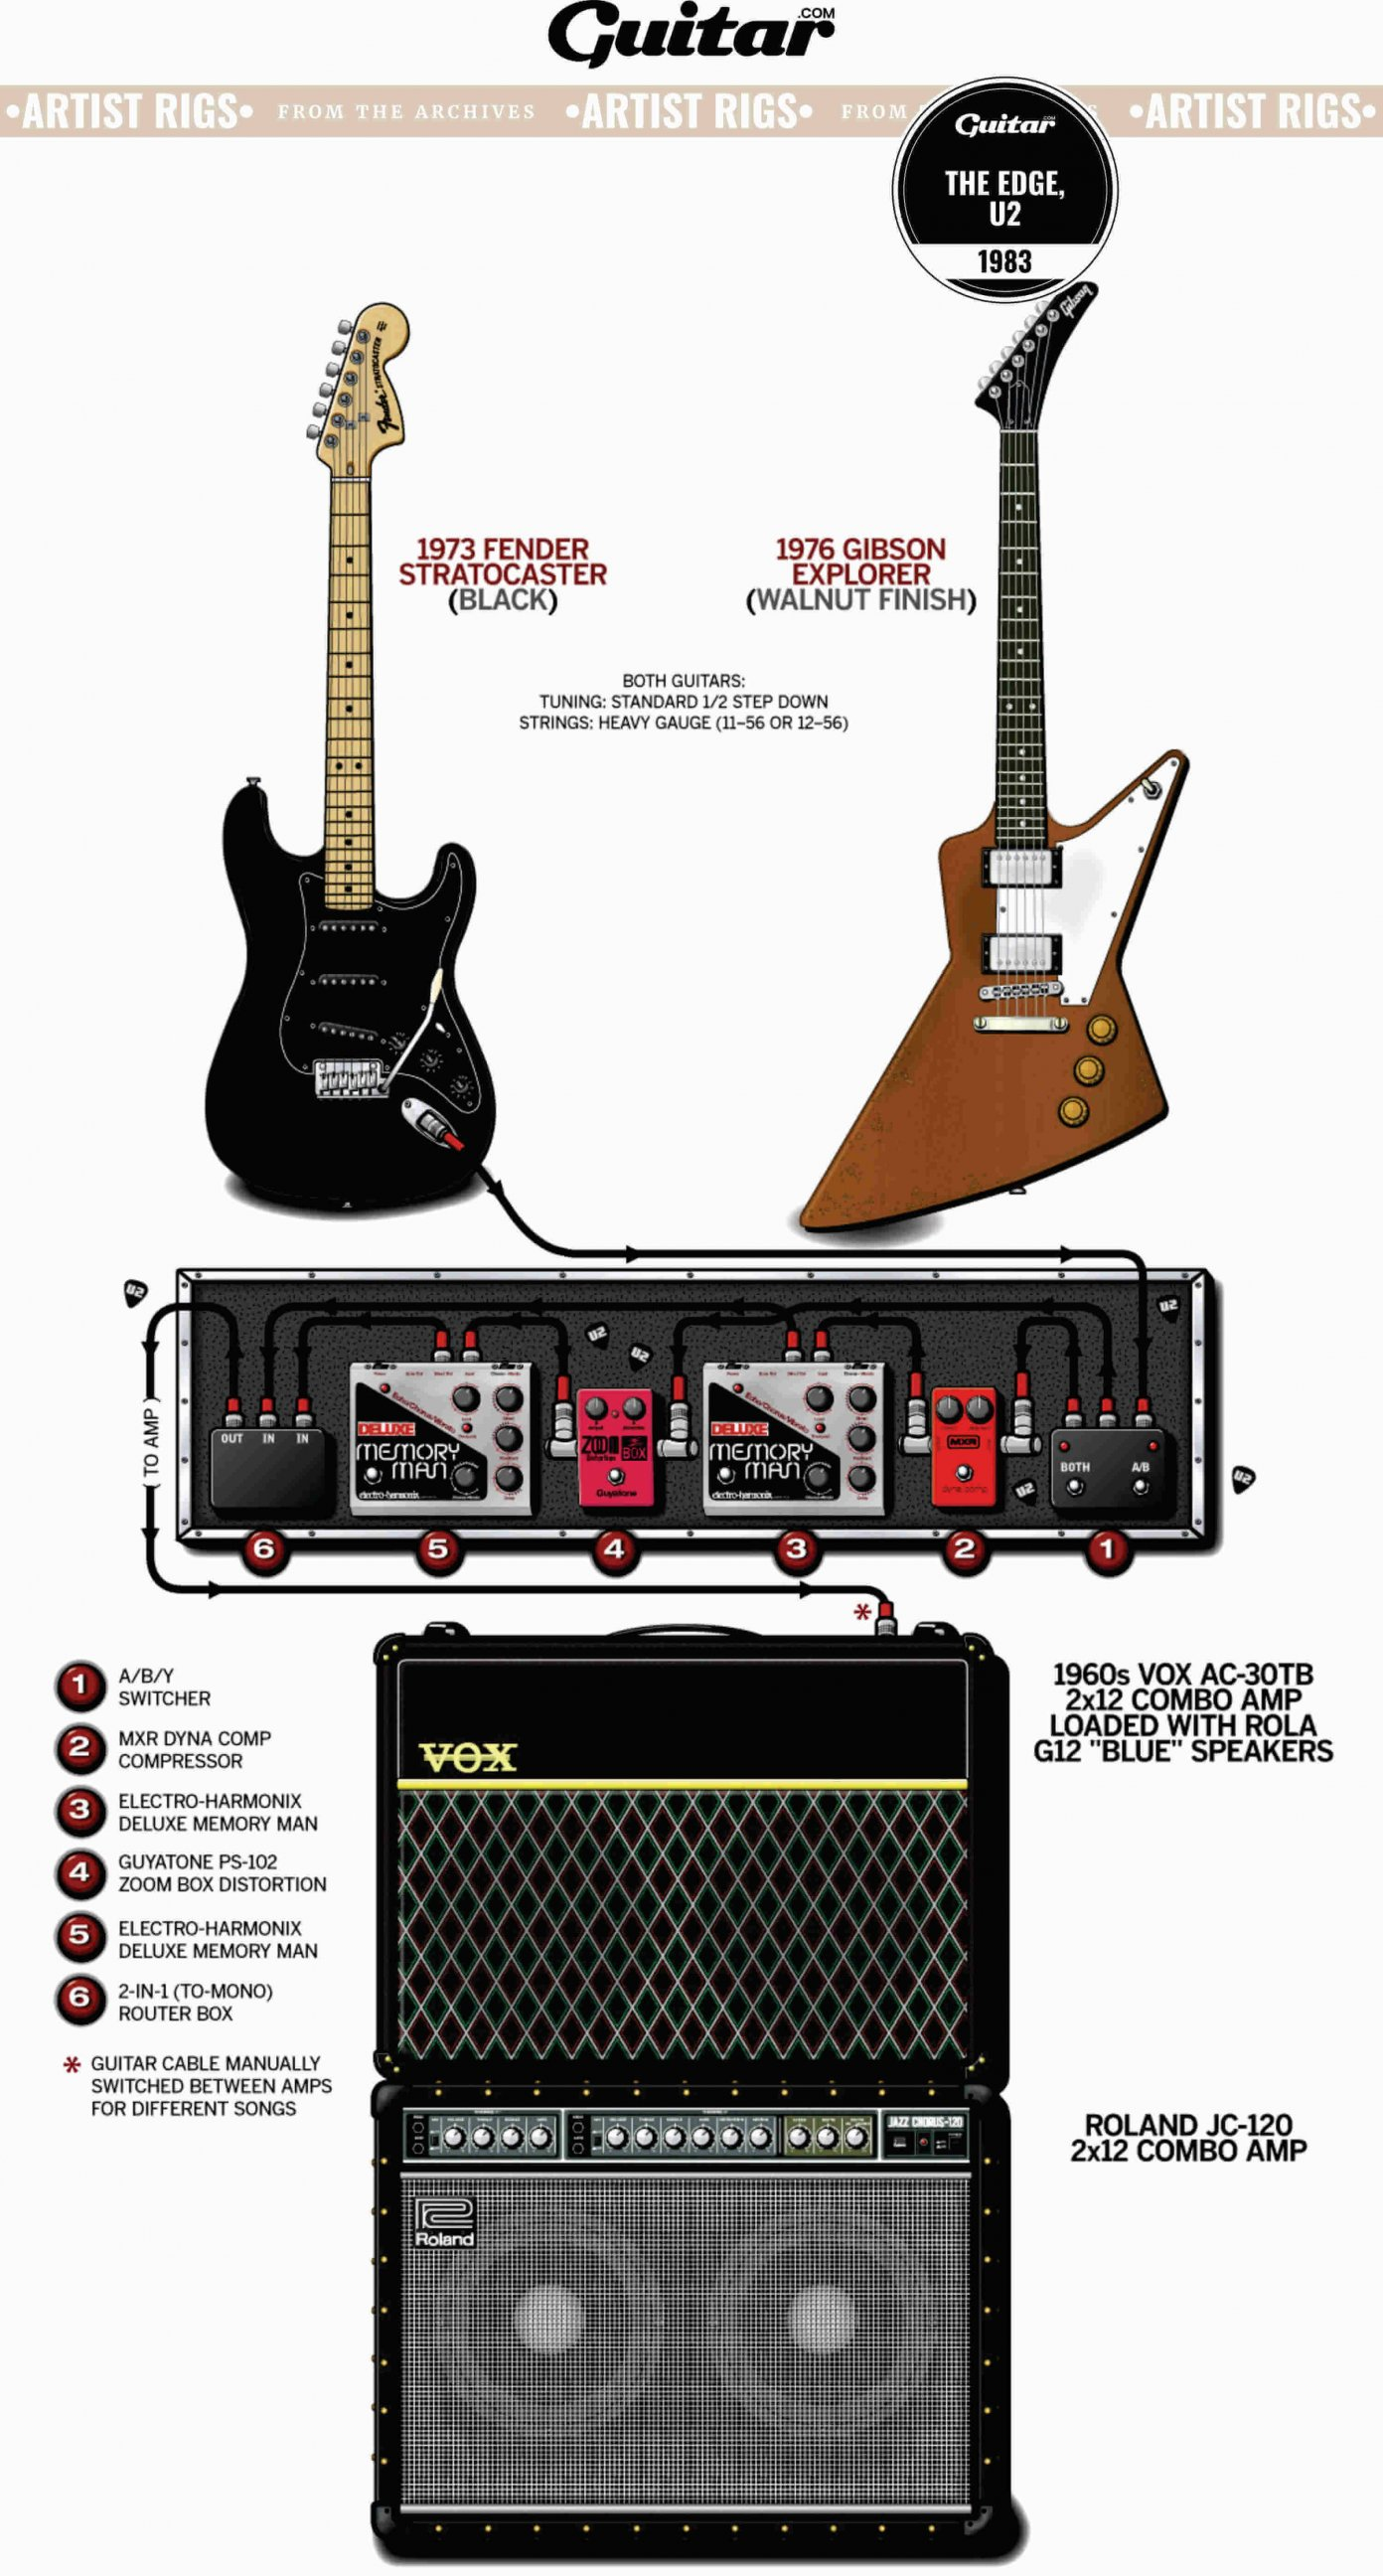 rig-diagram-The-Edge-U2-1983@3000x5587px